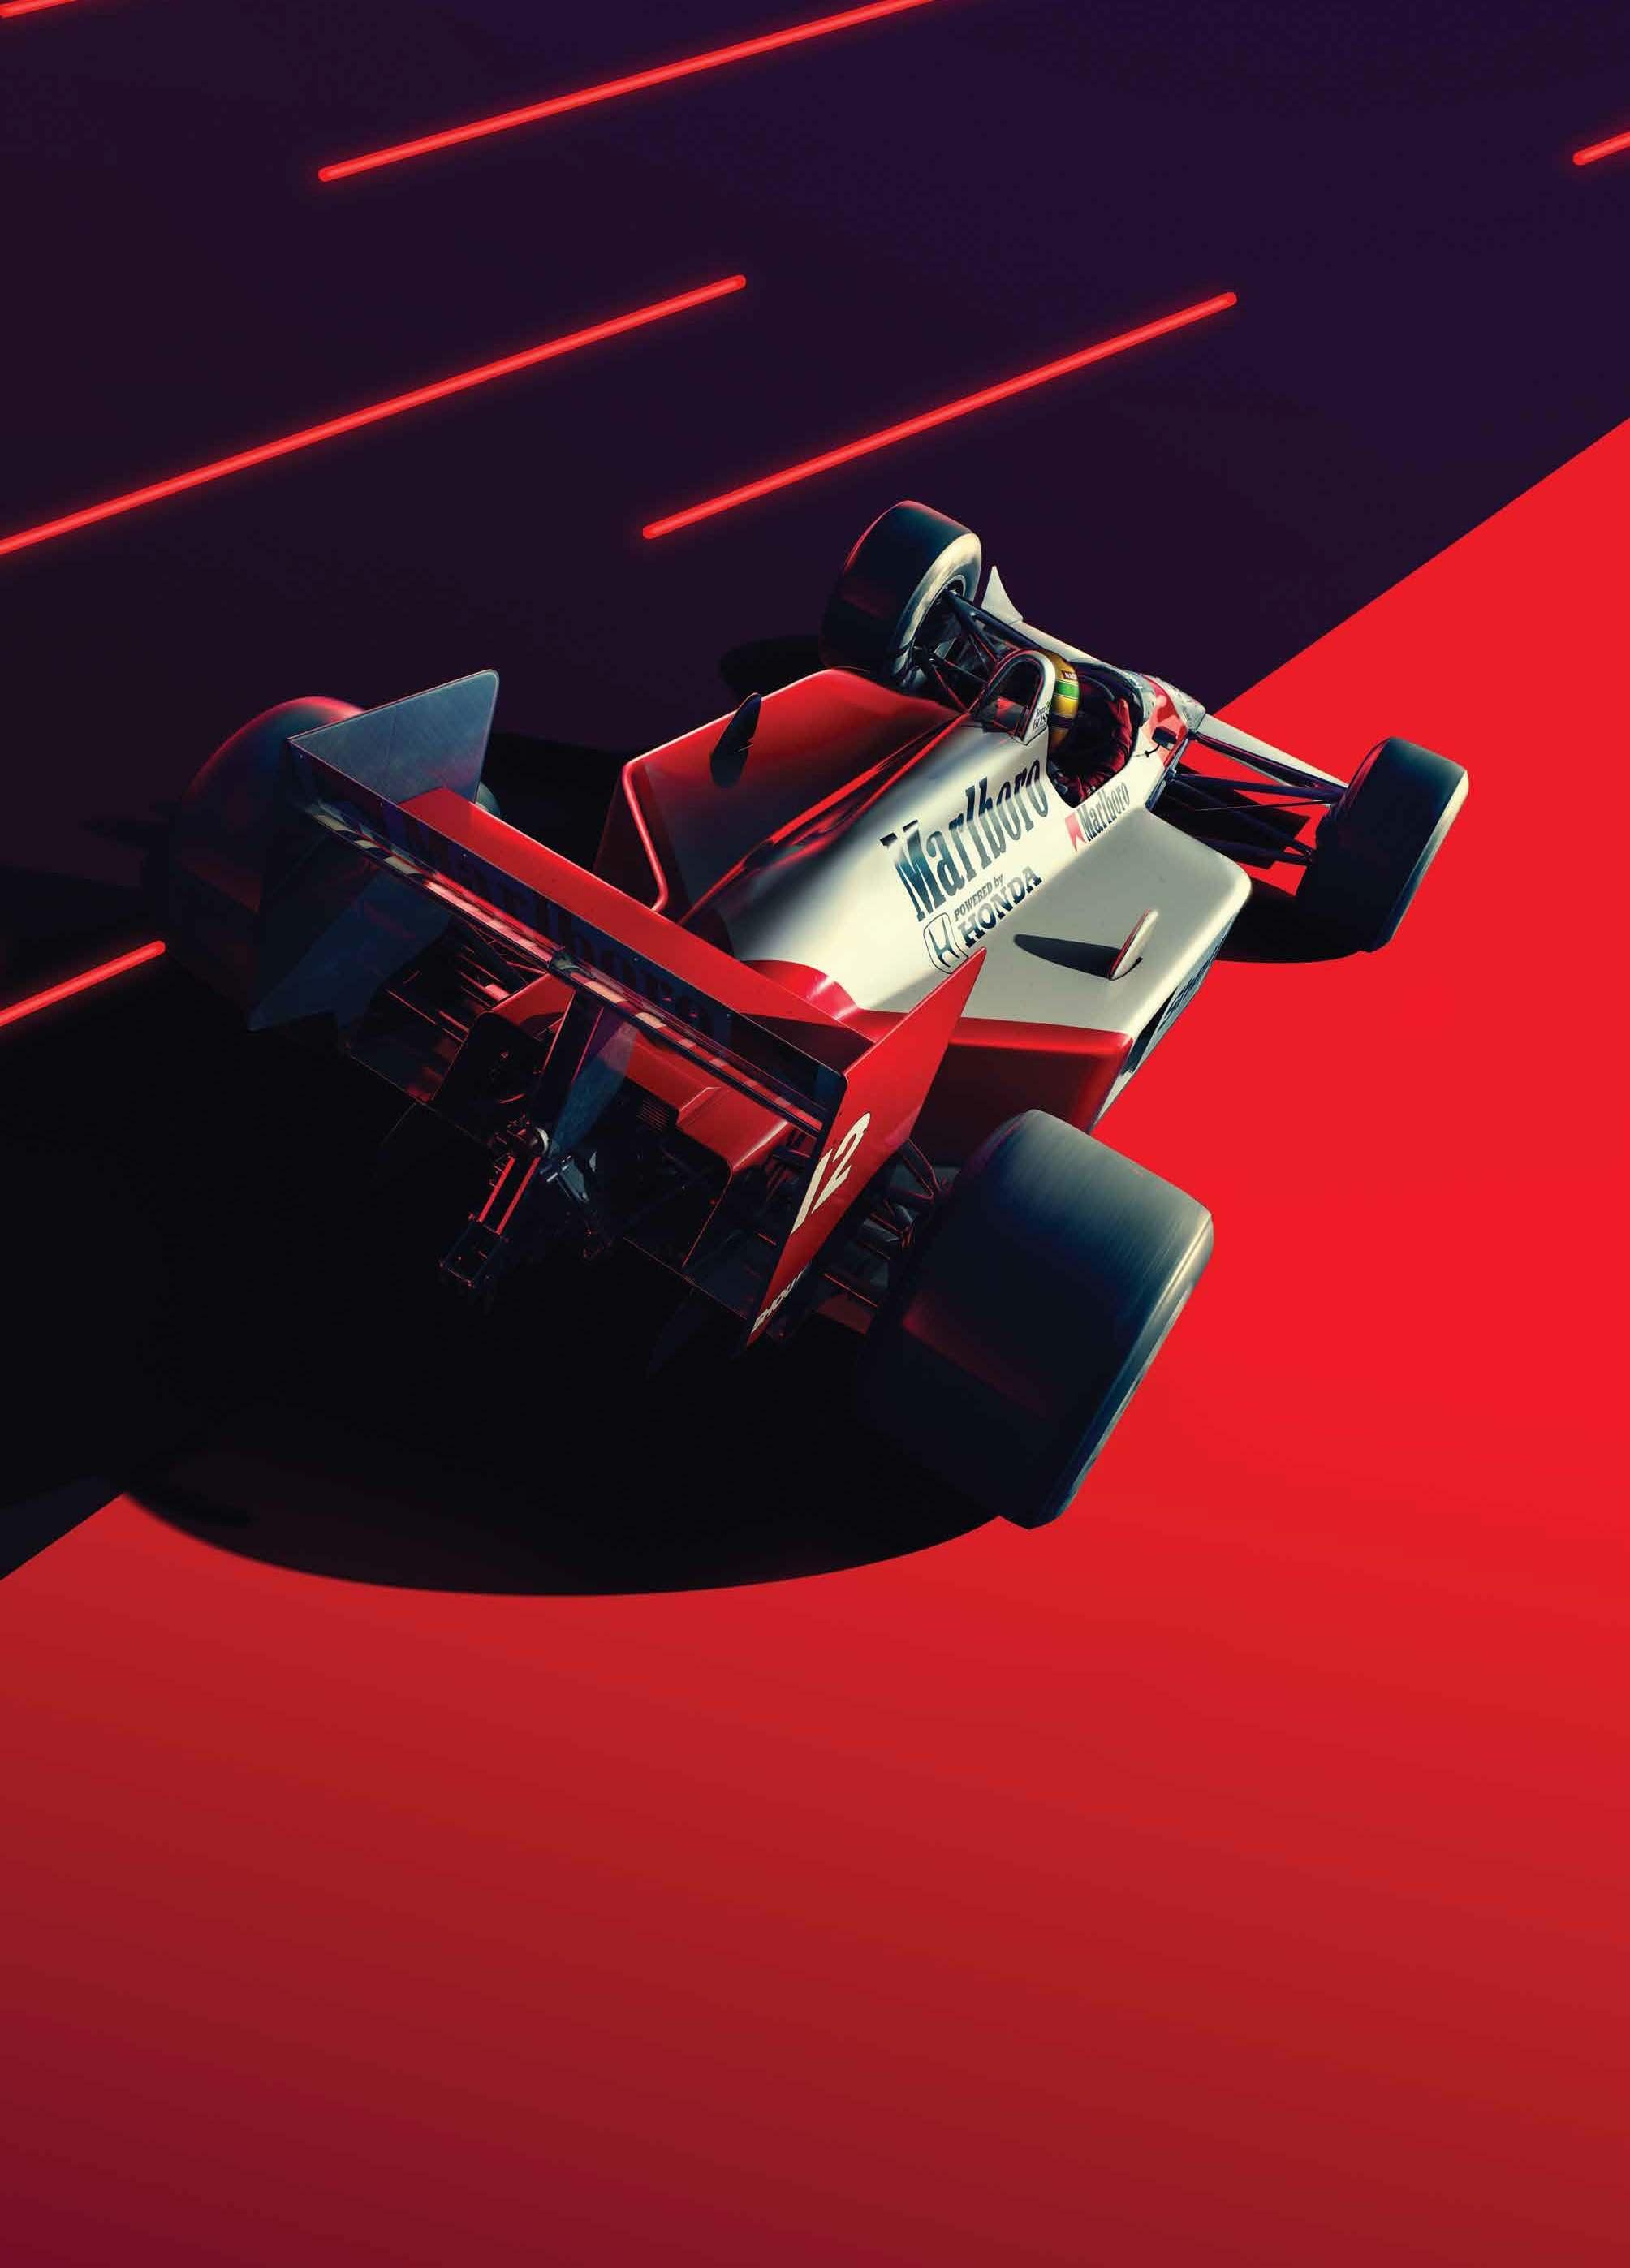 Limited Edition Original Print McLaren Formula 1 Car  *DISCOUNTED OFFERS*